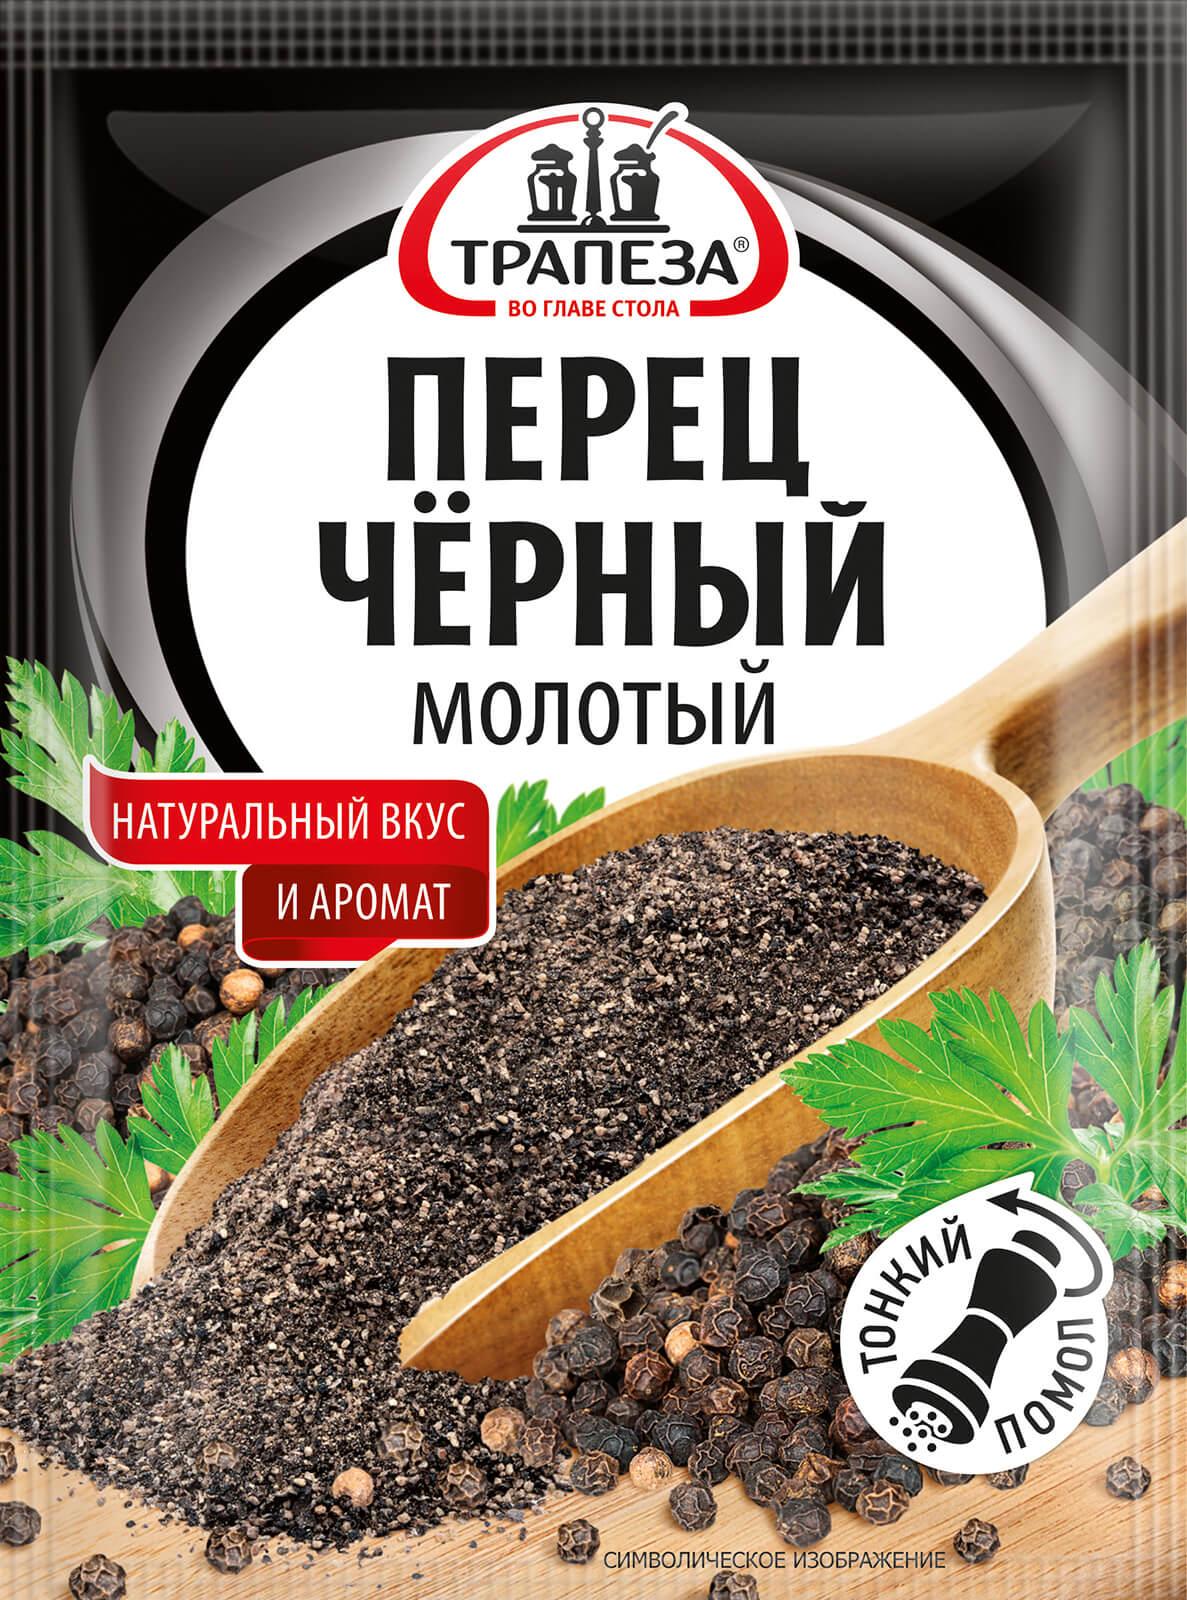 Перец черный молотый Трапеза 50г.